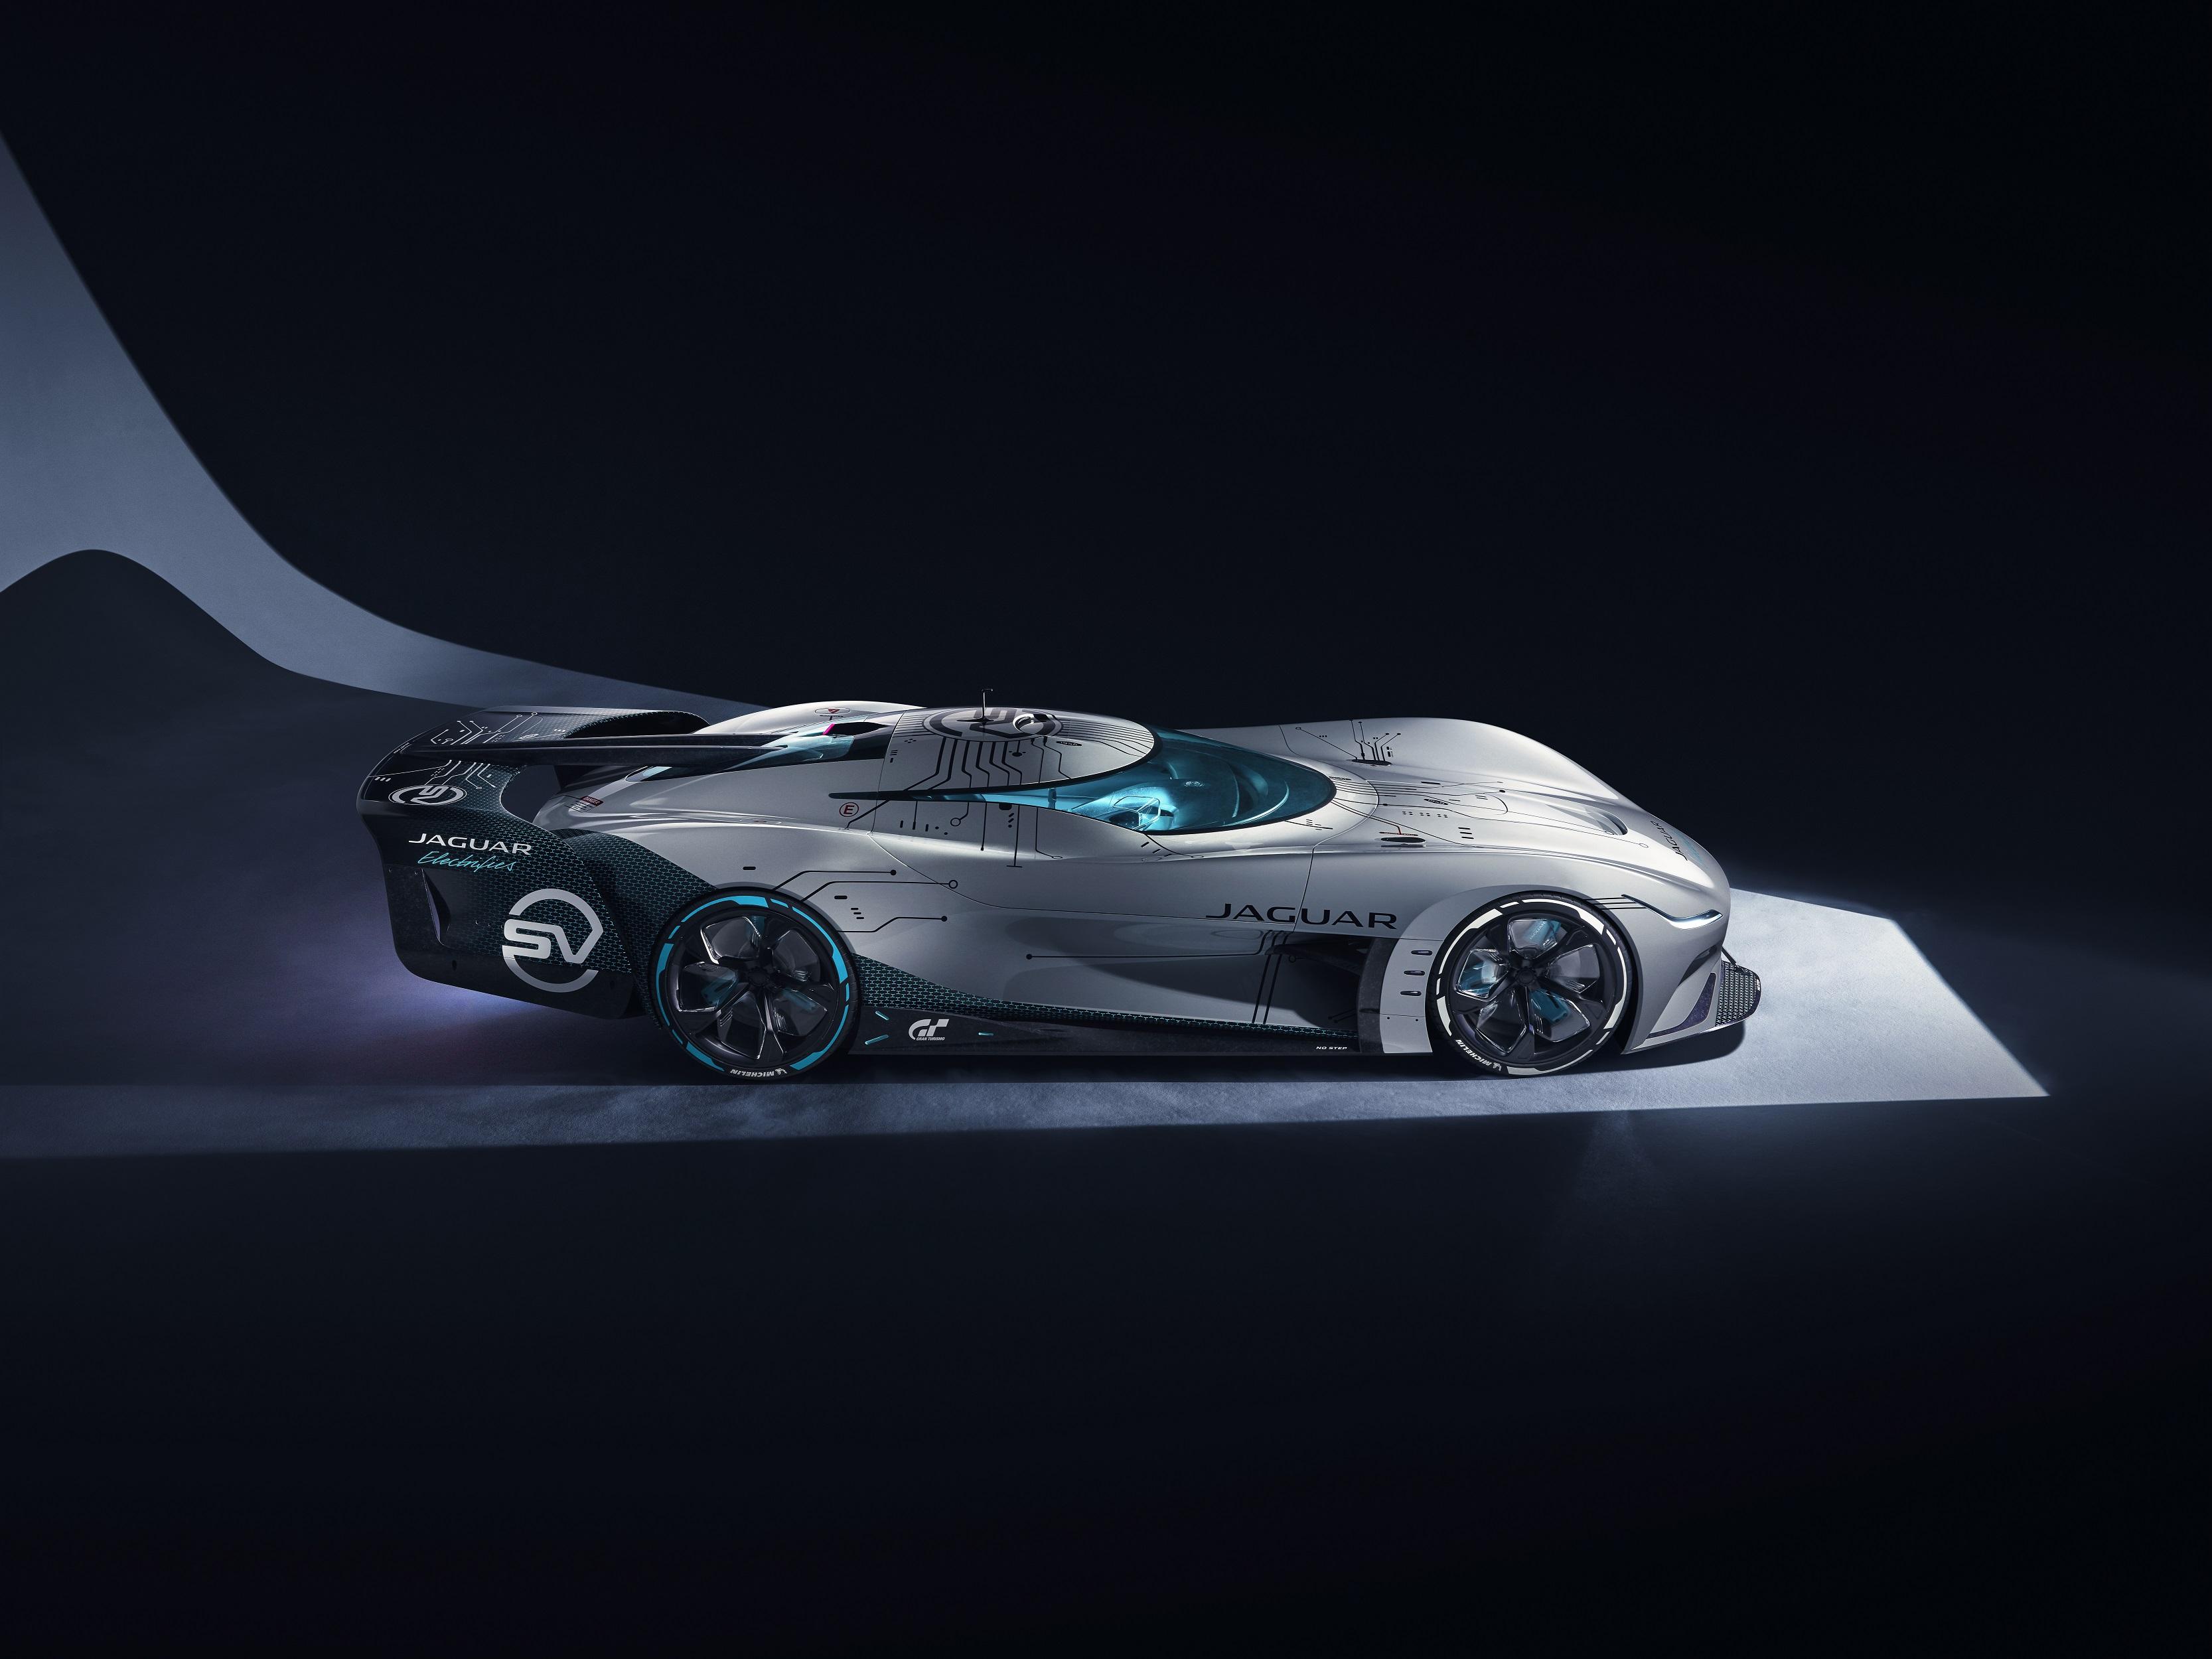 Introducing The Jaguar Vision Gran Turismo SV